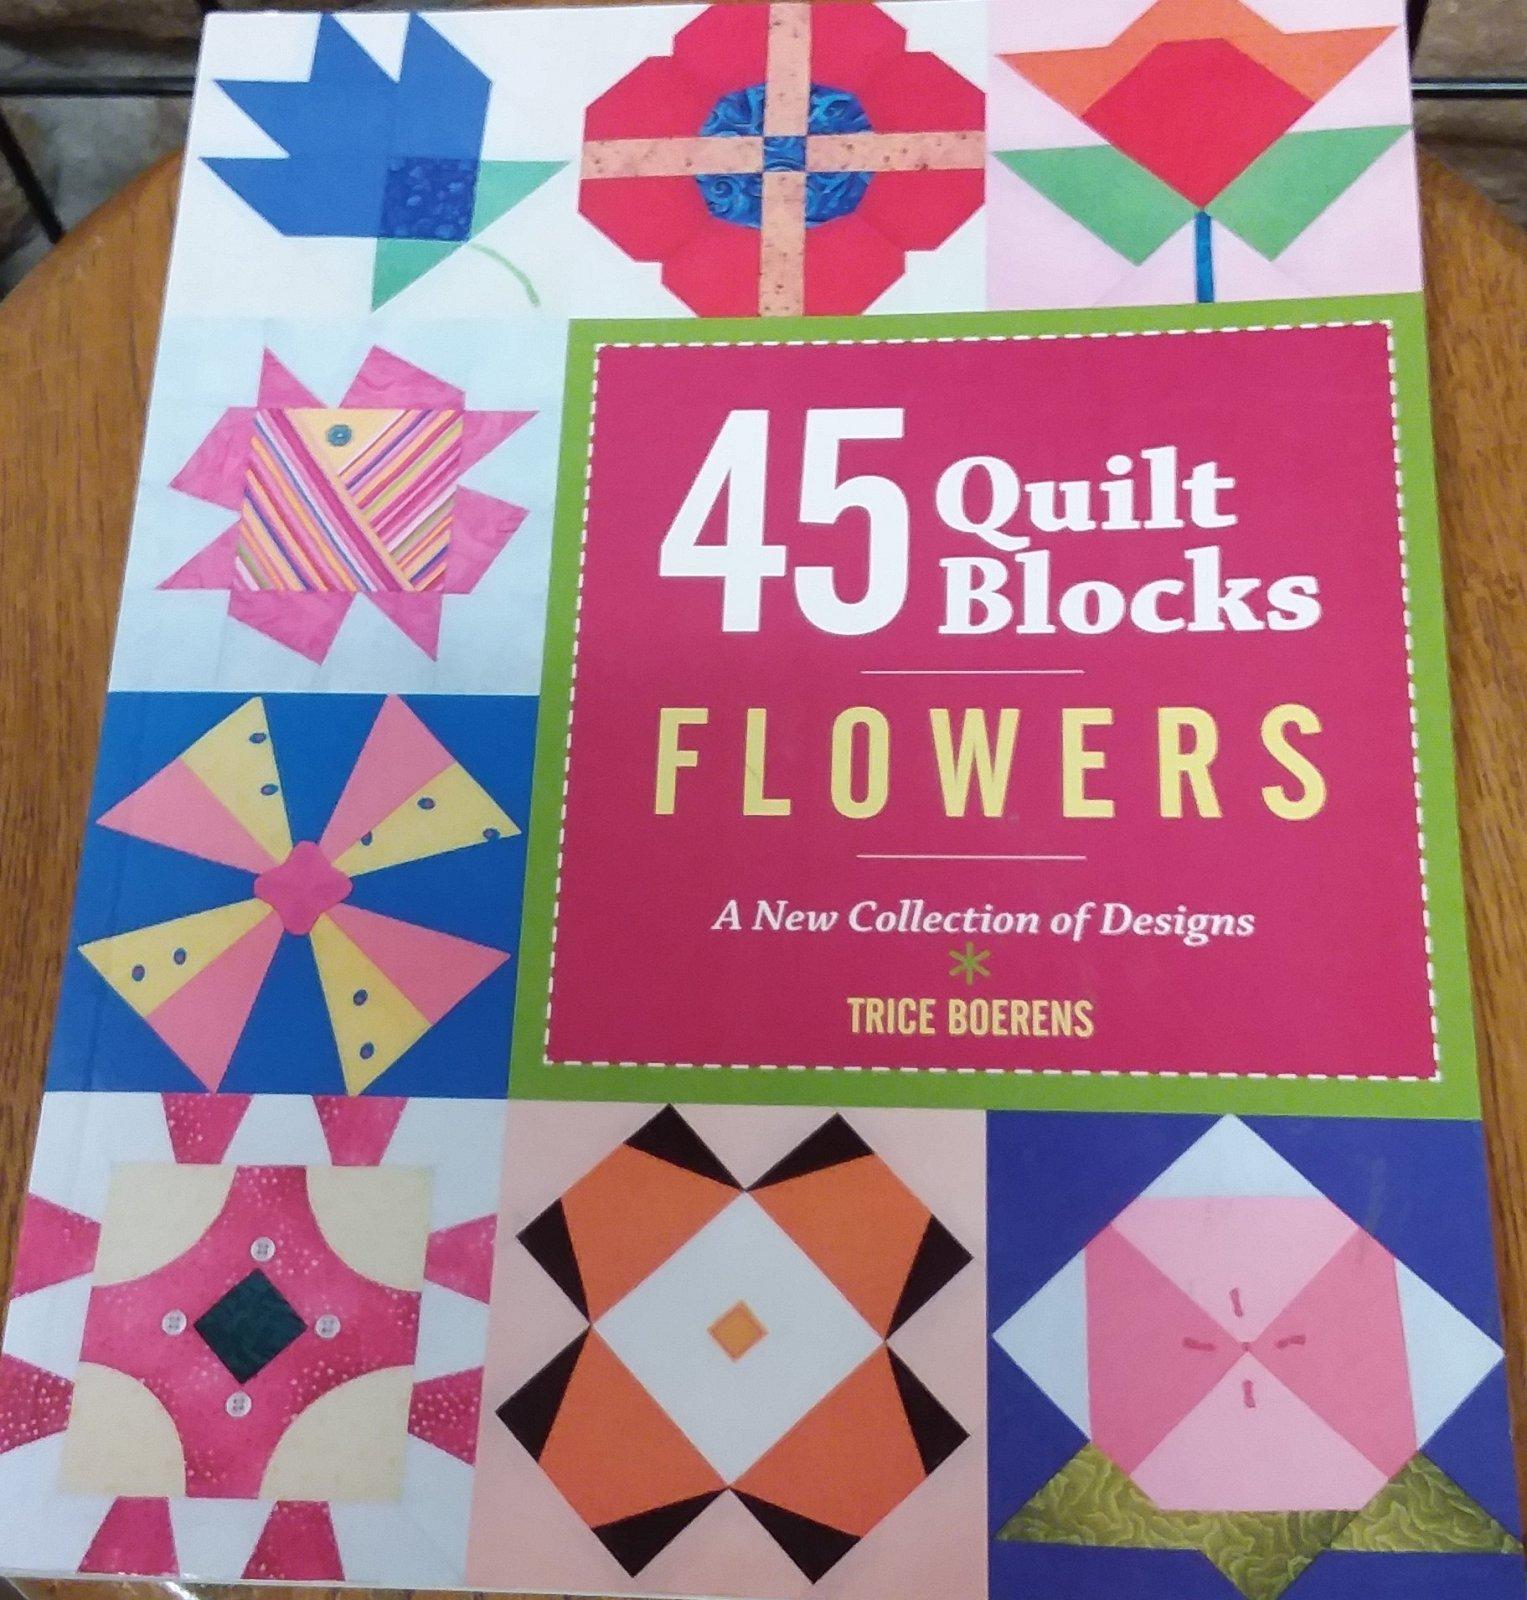 45 QUILT BLKS FLOWERS